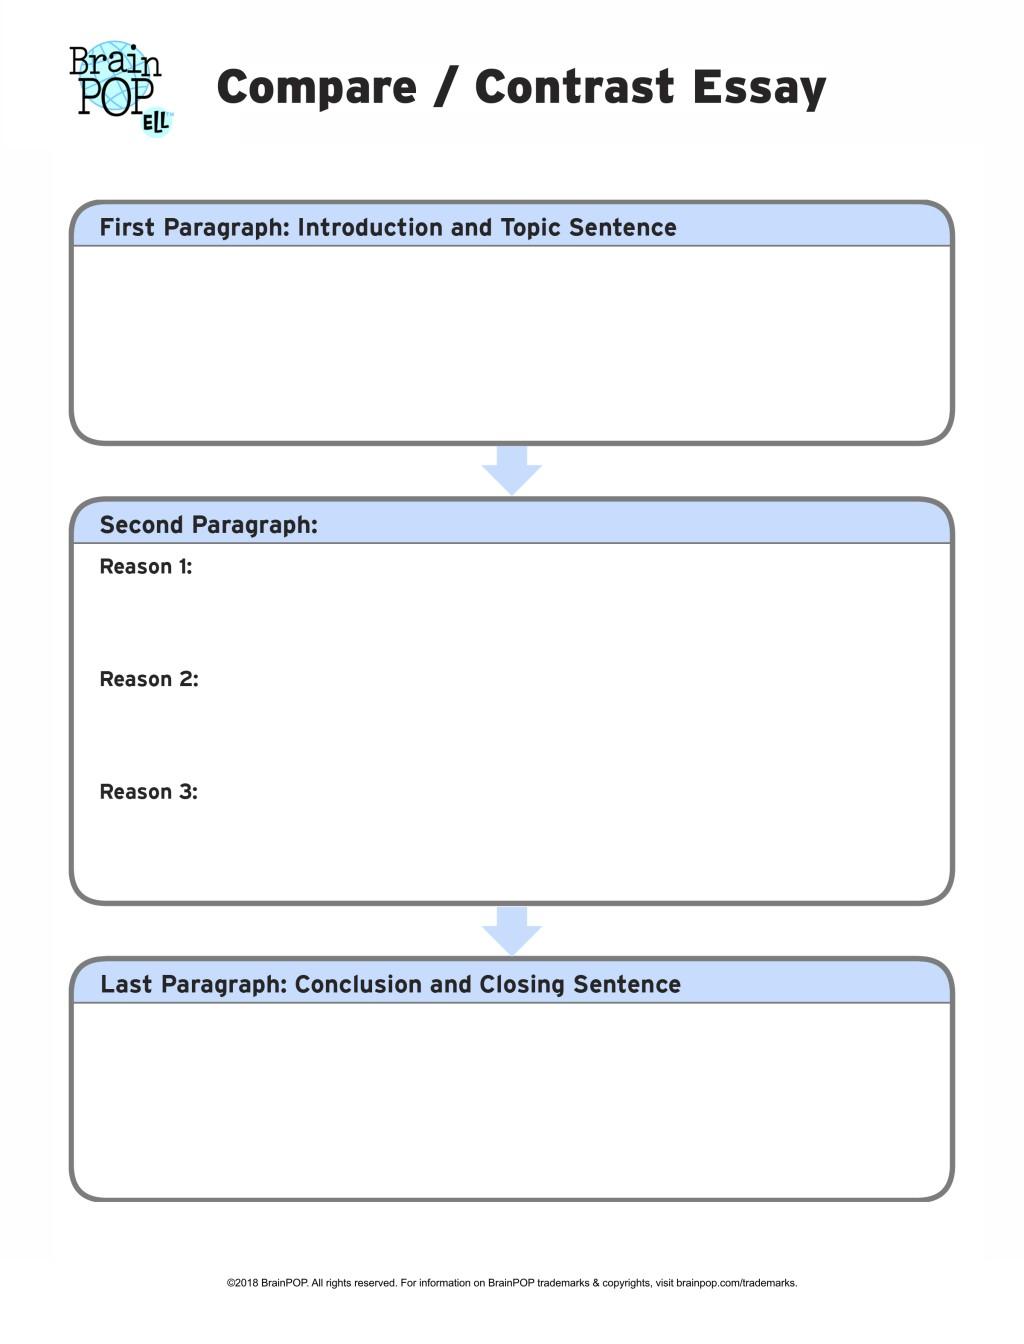 022 Essay Graphic Organizer Compare Contrast Incredible Narrative Pdf Persuasive Middle School Literary 5th Grade Large